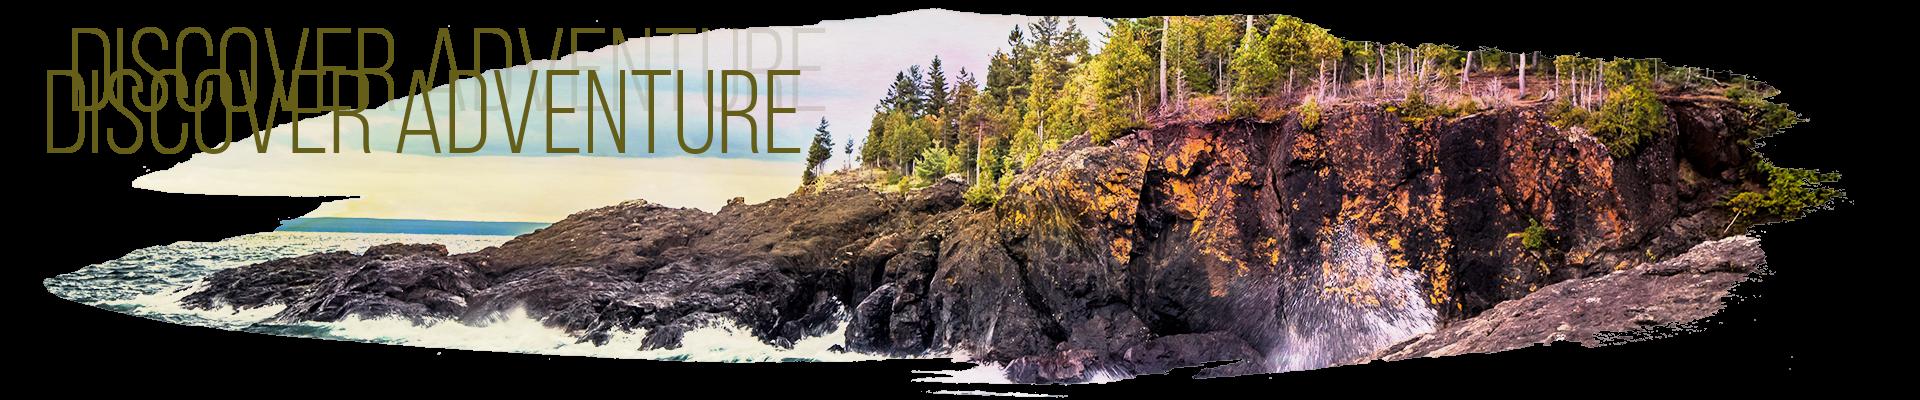 About Presque Isle Park - Discover Adventure